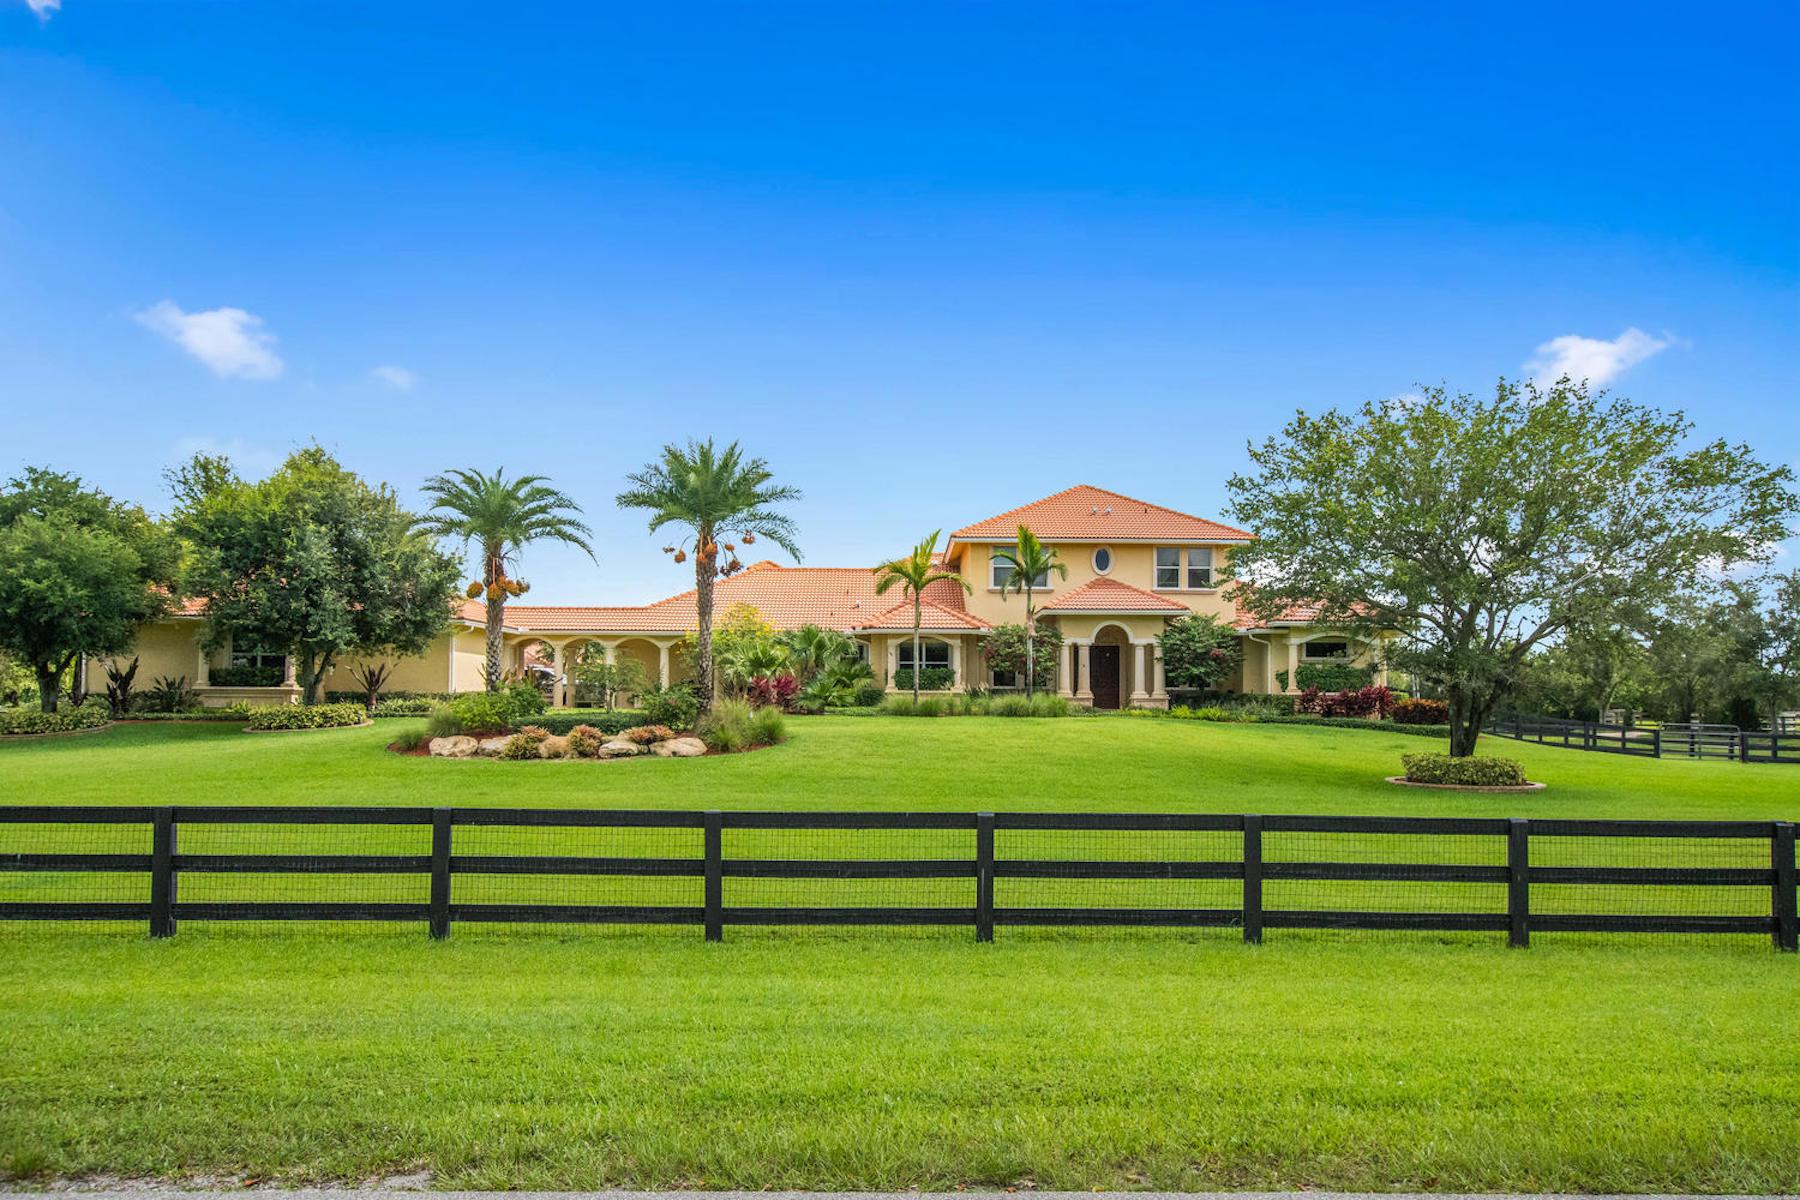 15511 Ocean Breeze Lane, Wellington, Florida 33414, 4 Bedrooms Bedrooms, ,4.1 BathroomsBathrooms,Single Family,For Sale,Palm Beach Point,Ocean Breeze,RX-10652433